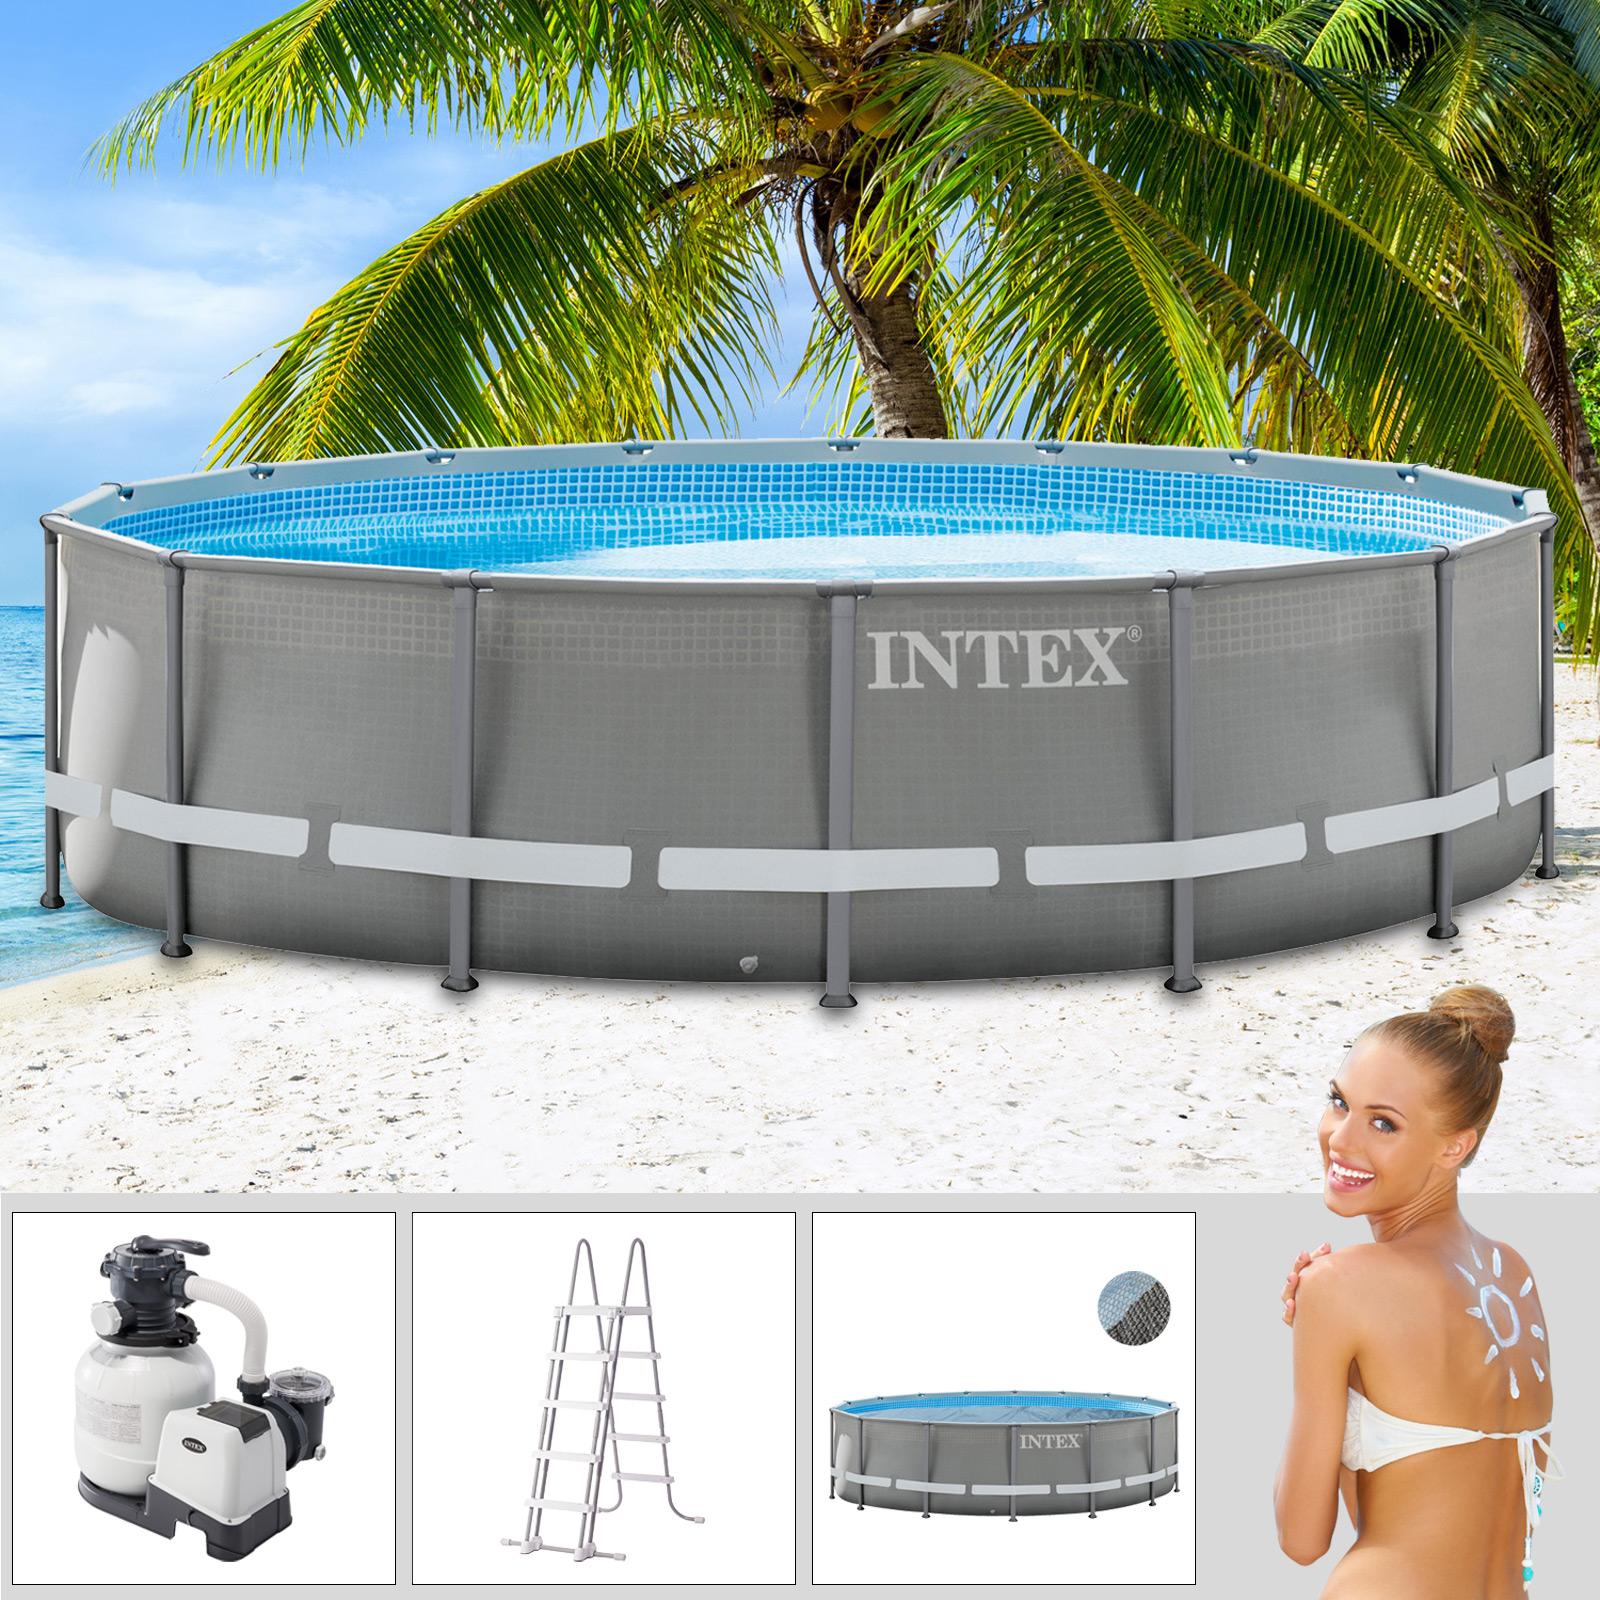 intex 549x132 cm swimming pool ultra frame stahlwand. Black Bedroom Furniture Sets. Home Design Ideas